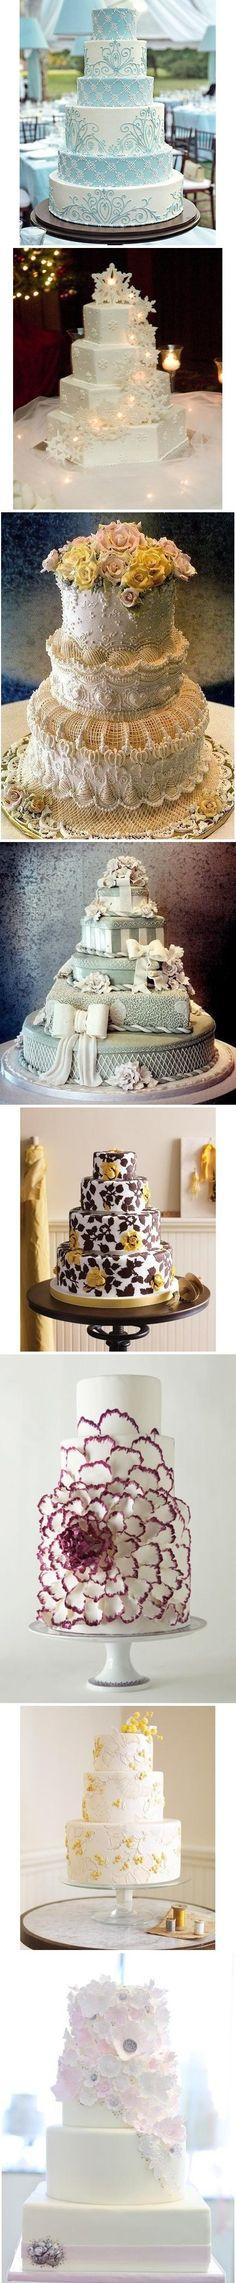 8 classic wedding cakes